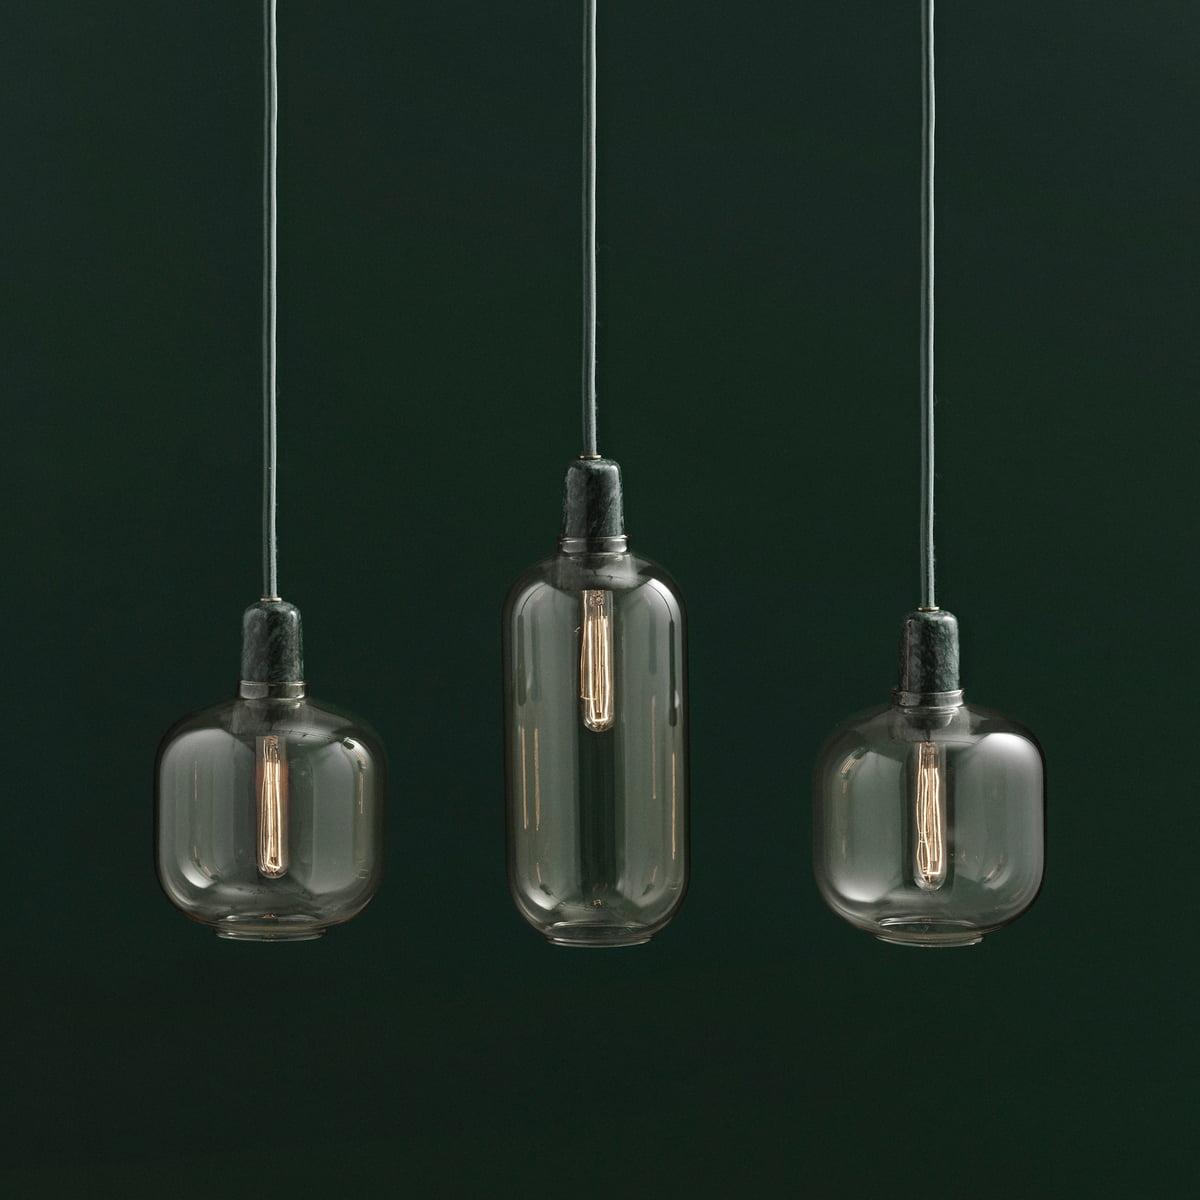 Amp pendant lamp by normann copenhagen normann copenhagen amp pendant luminaire gold green group aloadofball Gallery